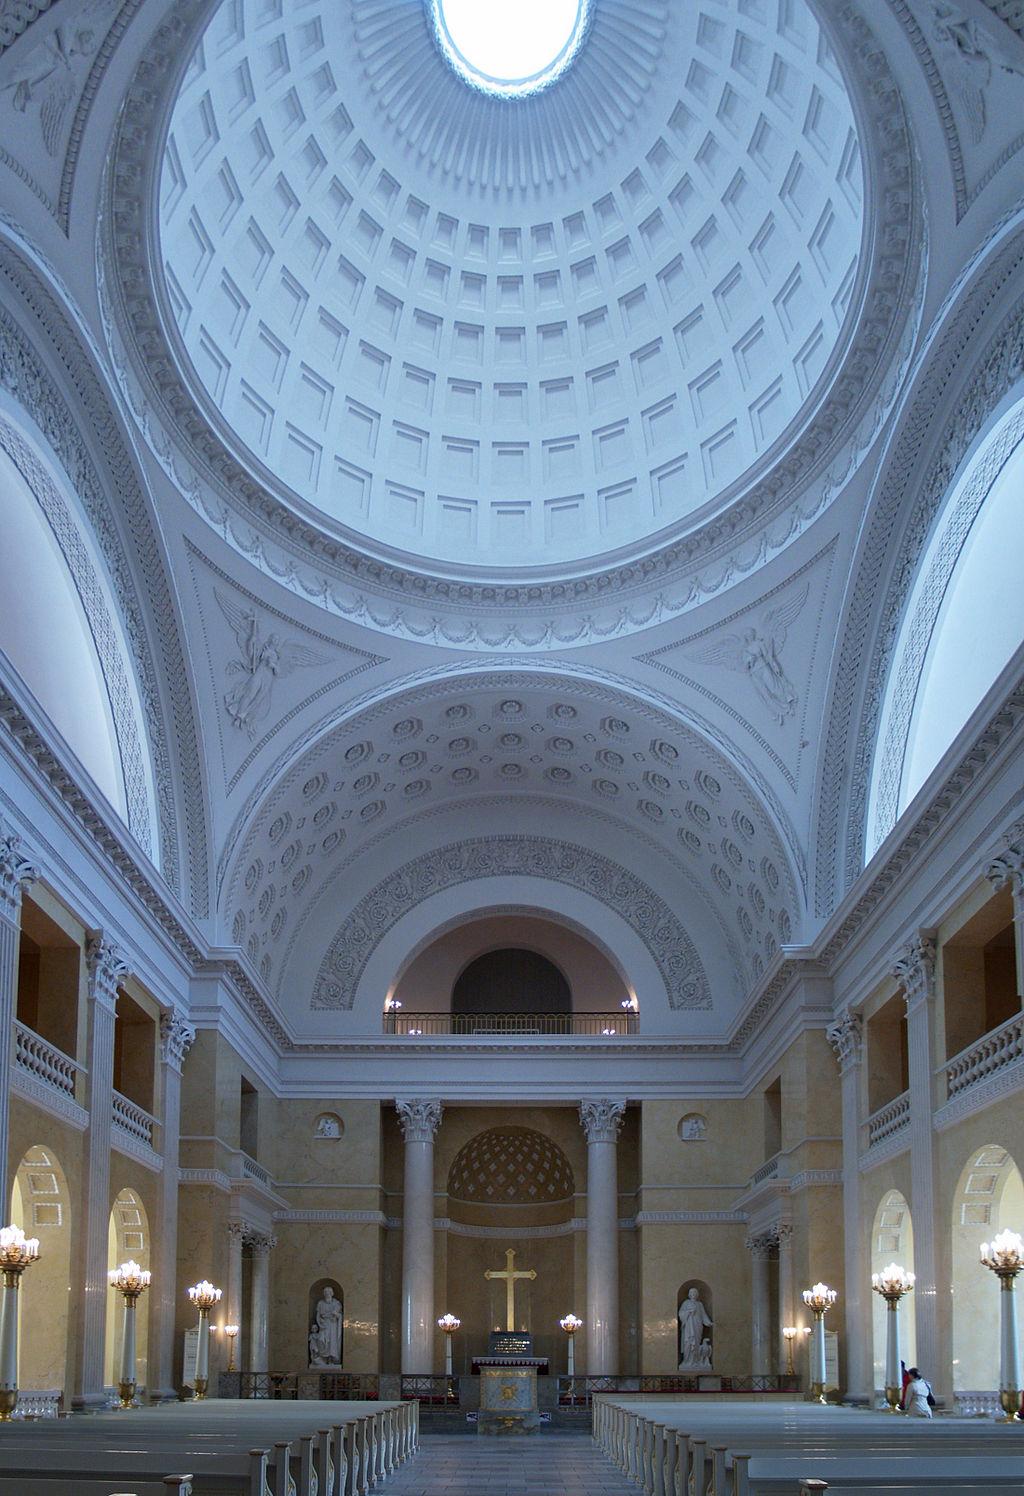 C.f.hansen, christiansborg palace church